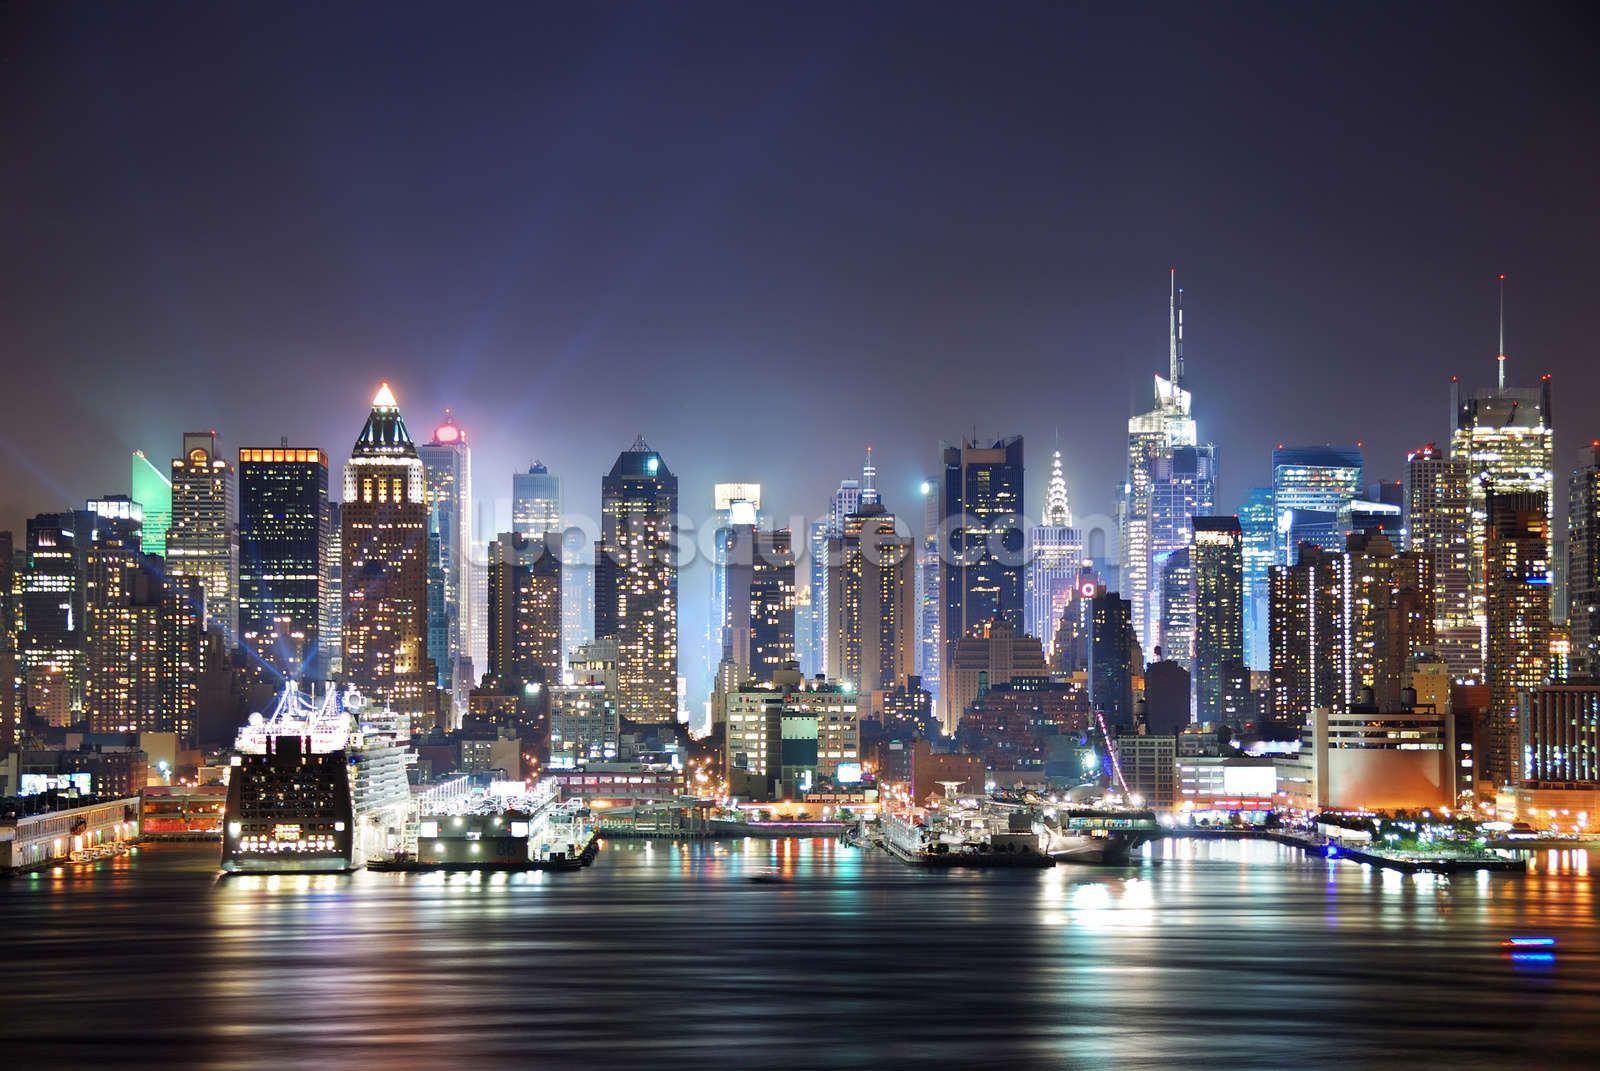 New York Manhattan Skyline Night Wallpaper Mural Wallsauce Eu In 2021 New York Wallpaper York Wallpaper New York Bedroom